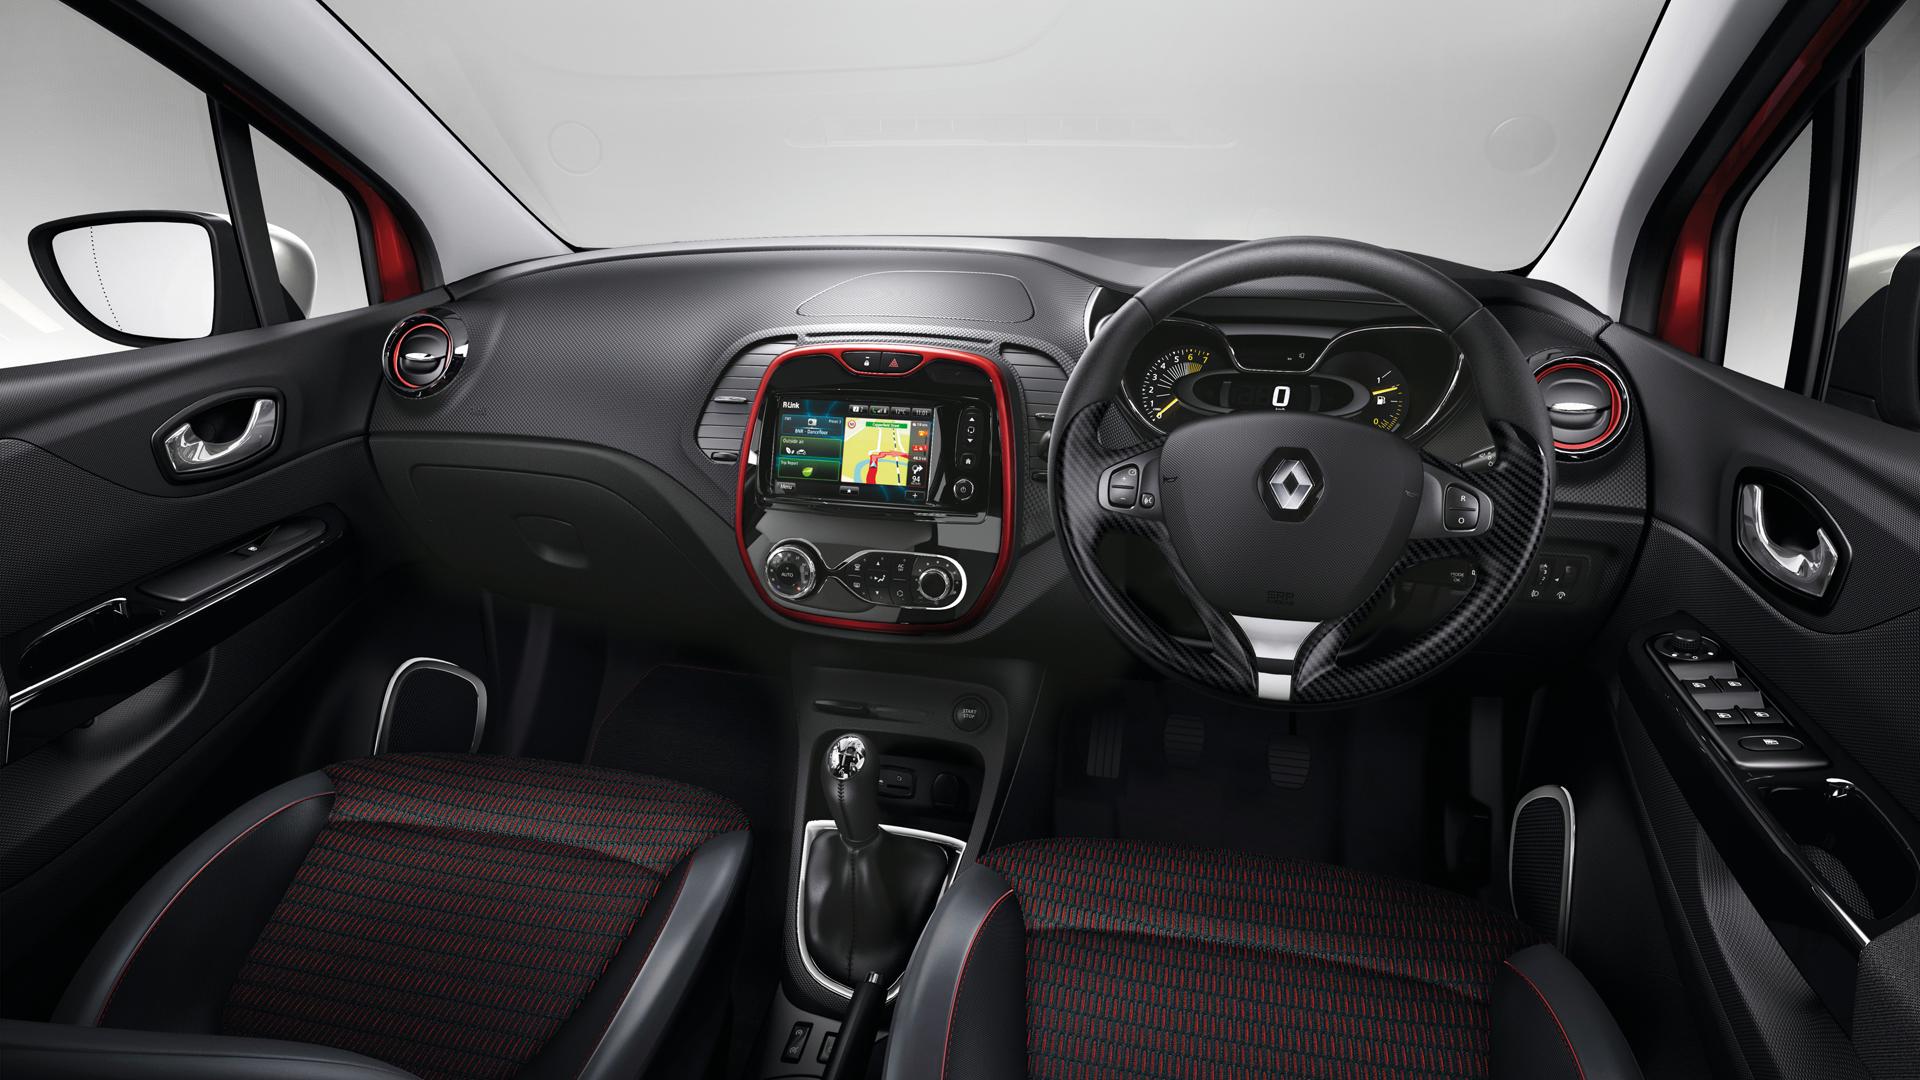 The new Renault Captur interior | Captur (coming soon) | Pinterest ...